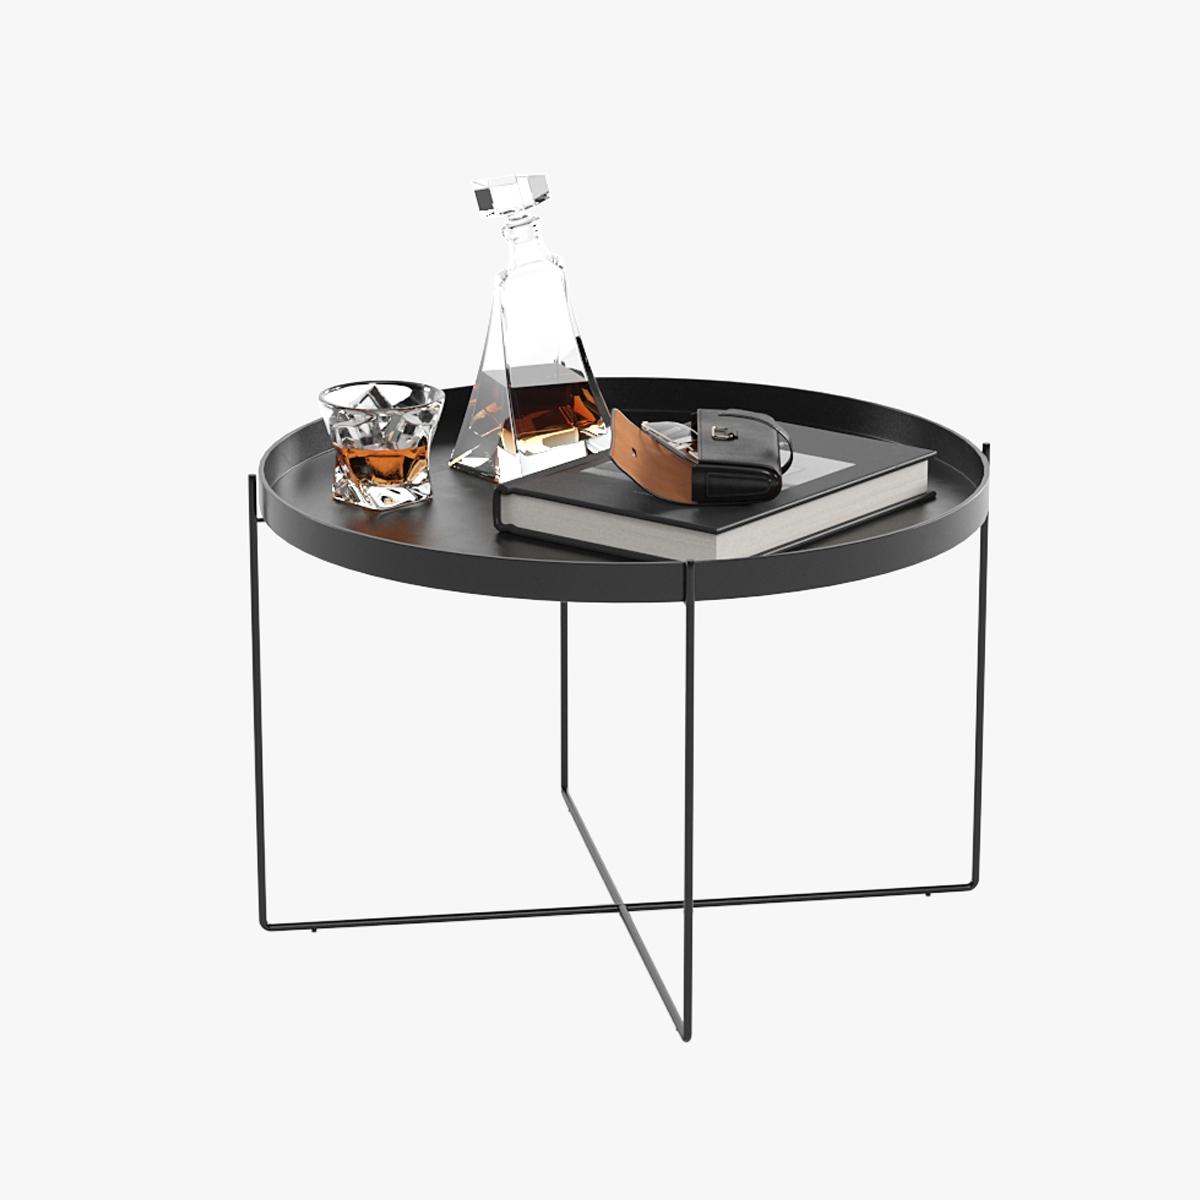 Coffee Table Accessories 3d Model Turbosquid 1330658